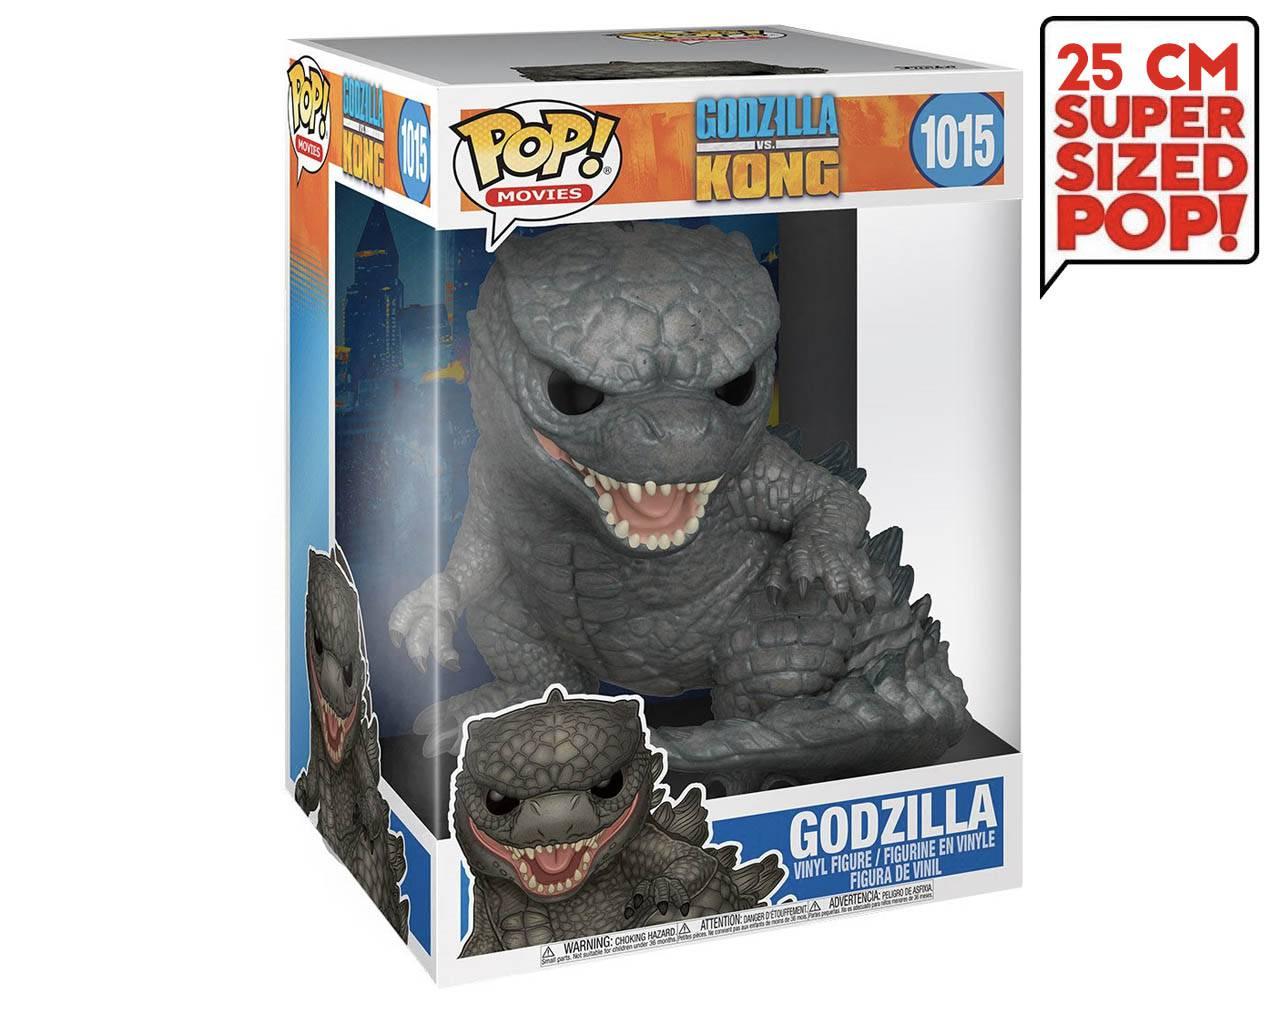 Godzilla (25 cm) Super Sized Pop! Vinyl